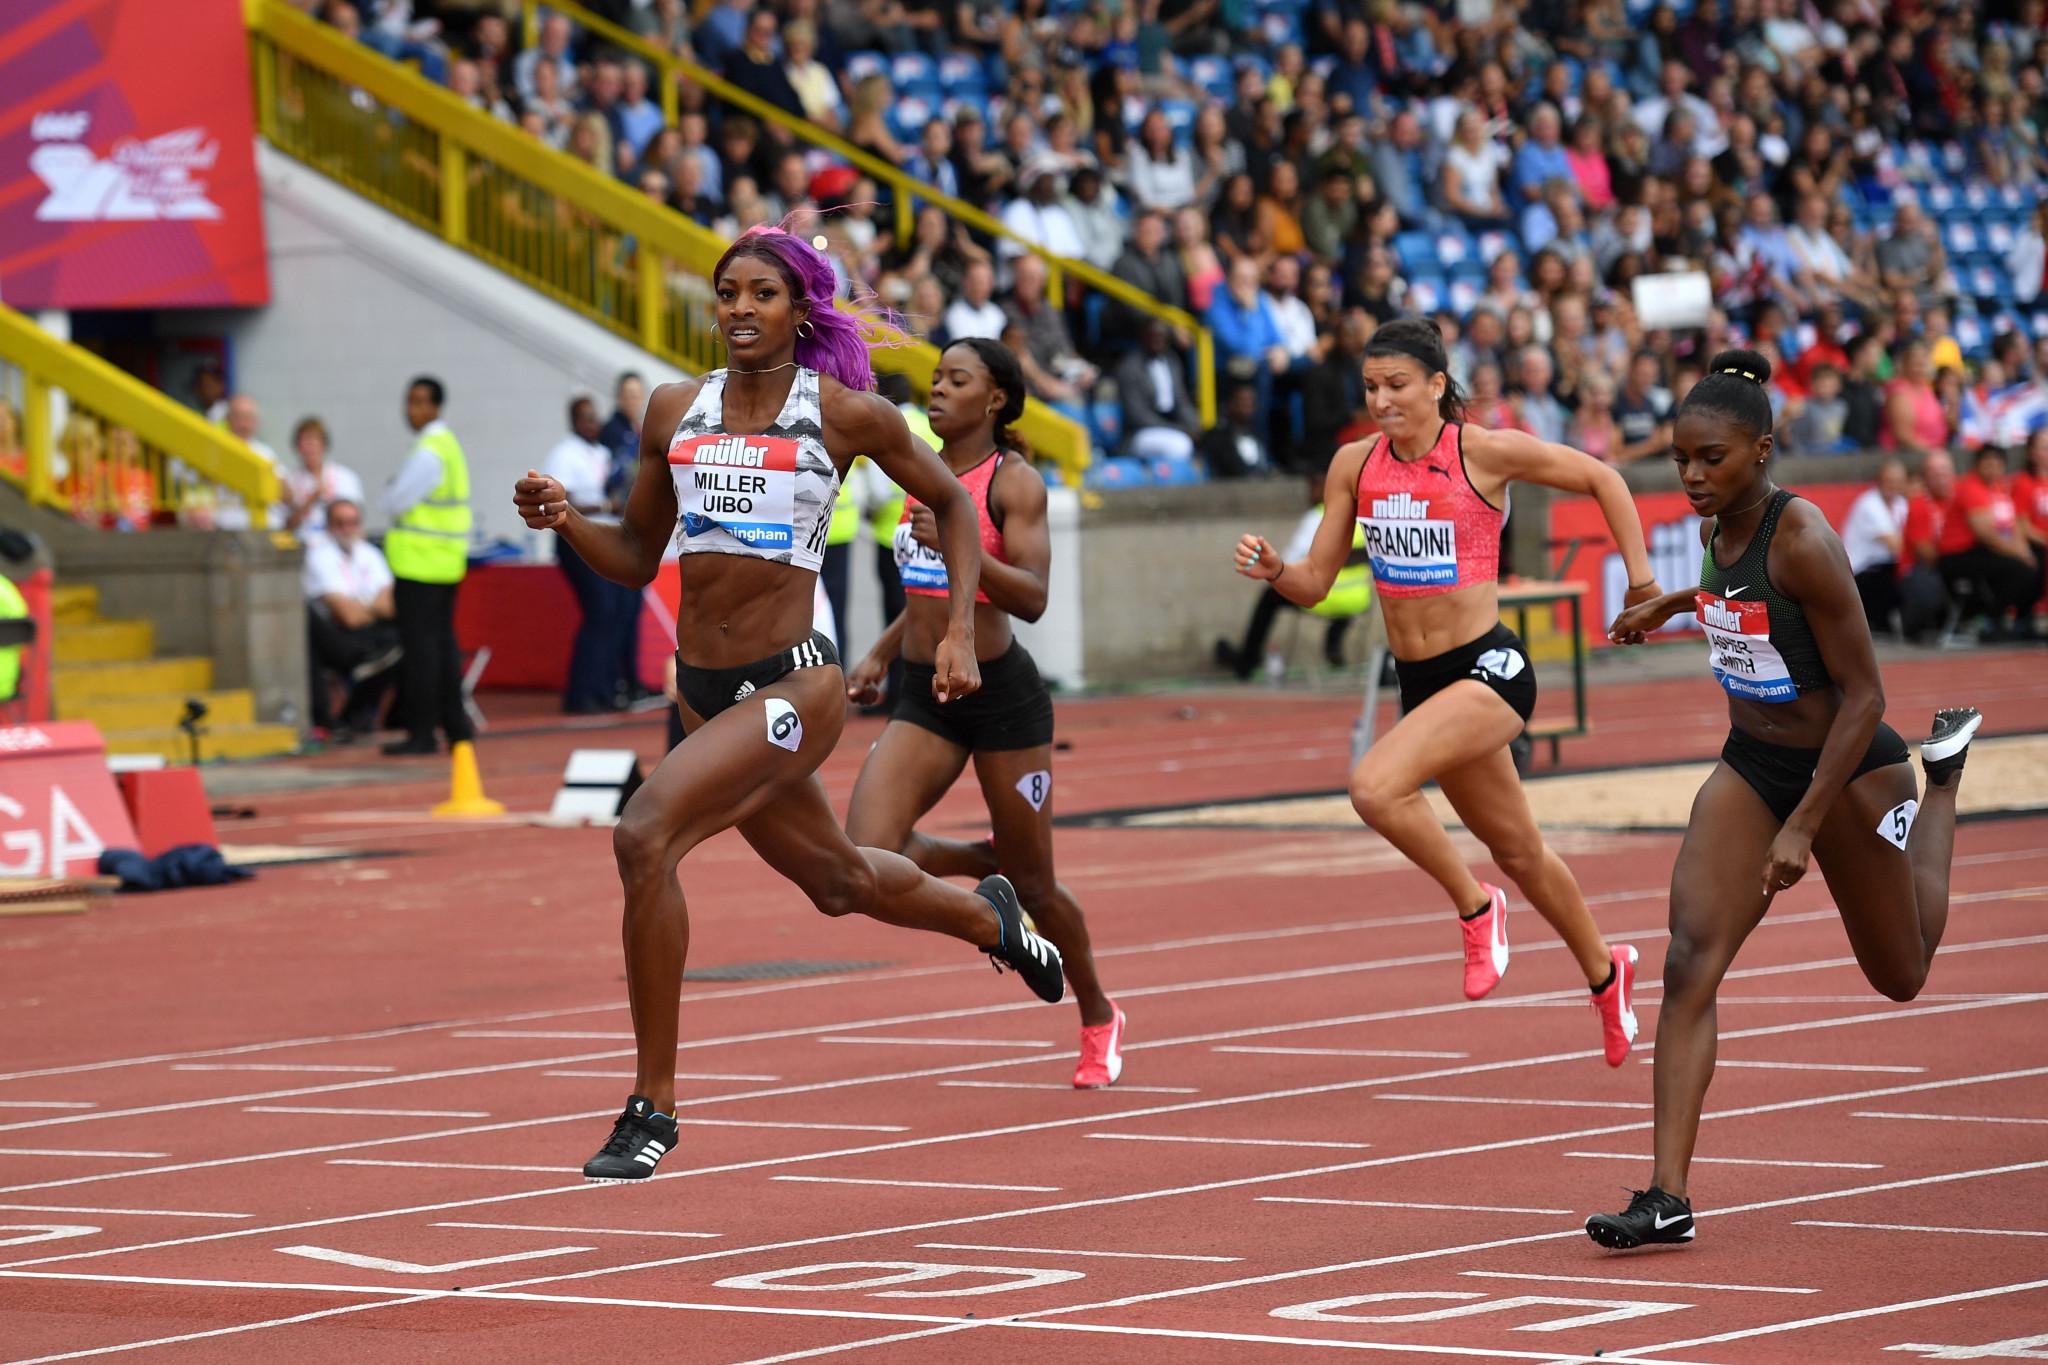 Stellar women's 200m set to headline IAAF Diamond League meeting in Birmingham